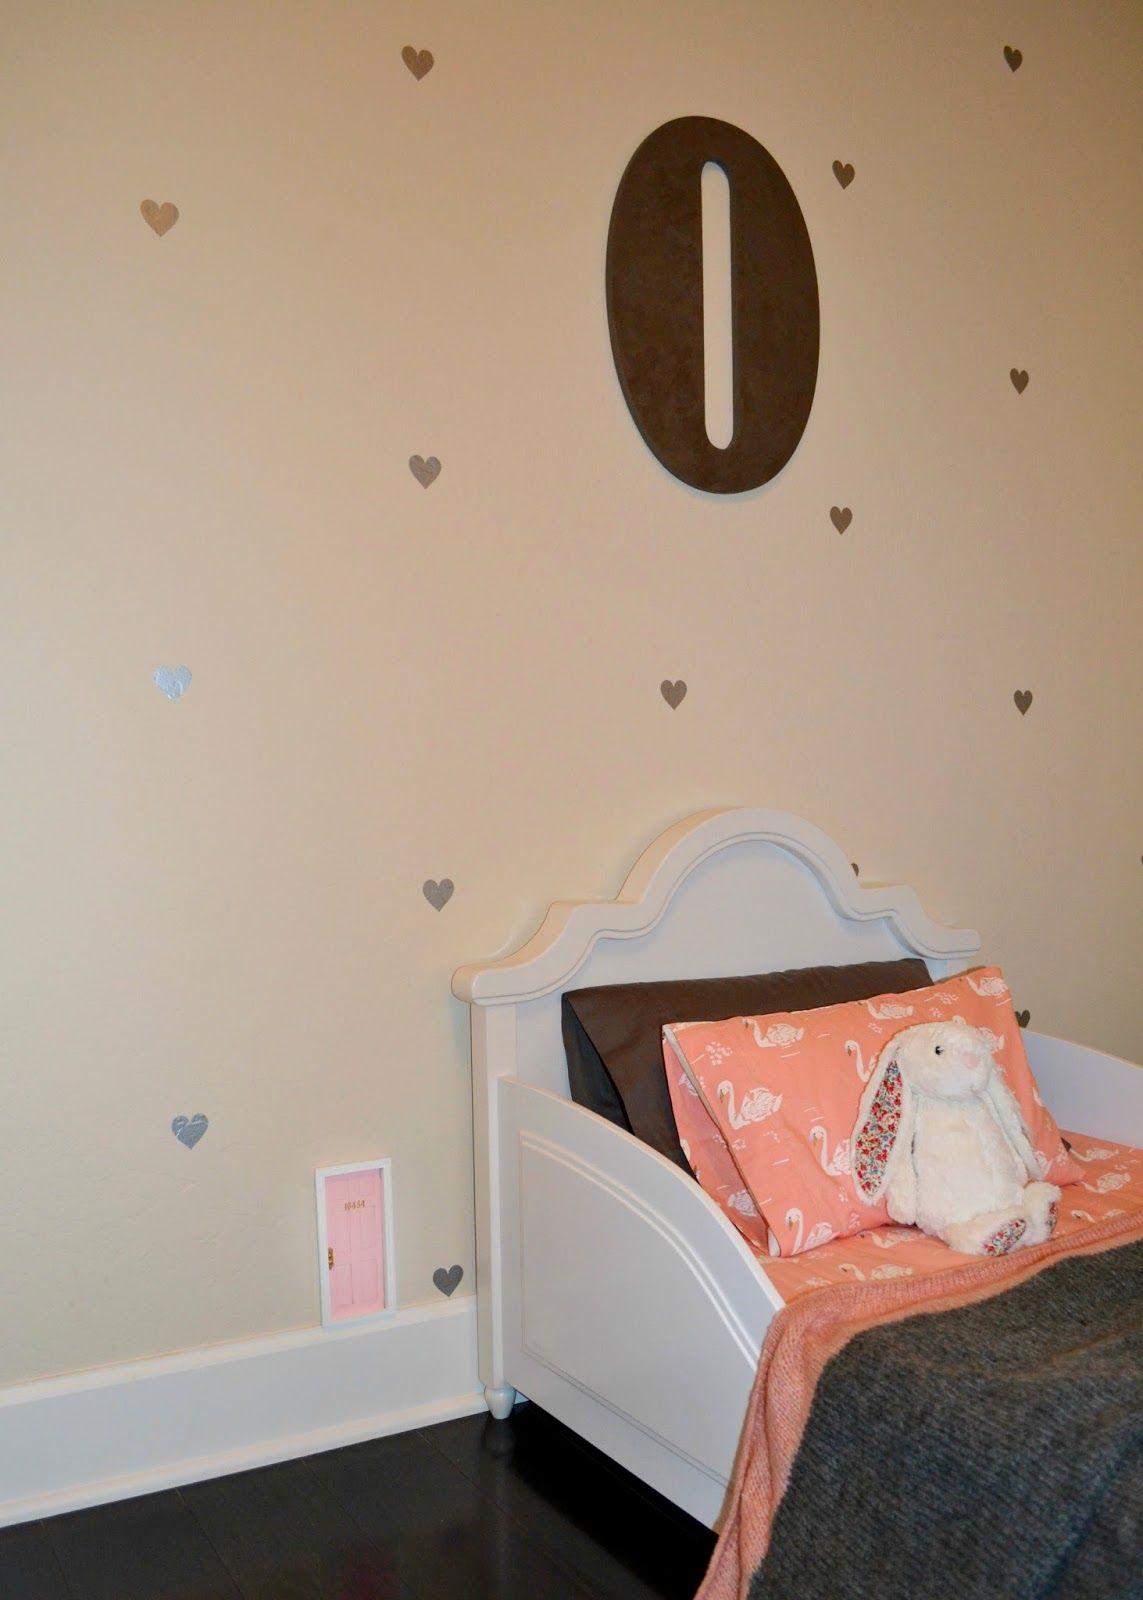 DIY Tooth Fairy Door | DETTE CAKES | Gia | Pinterest | Tooth fairy ...